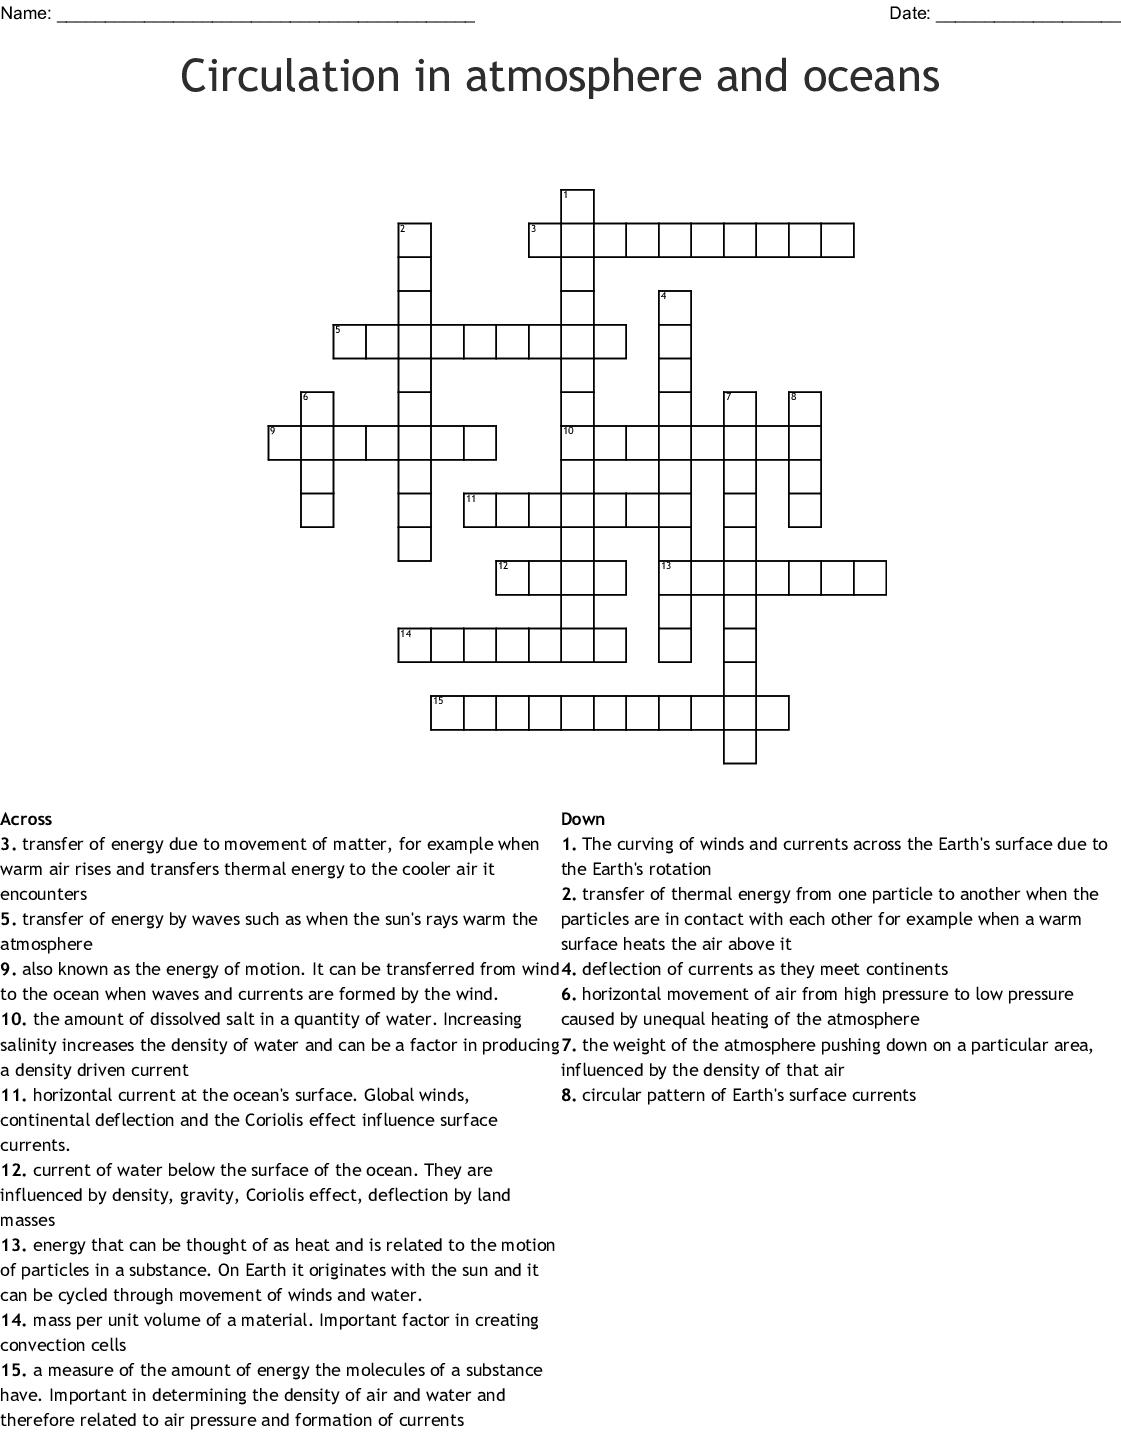 Circulation In Atmosphere And Oceans Crossword